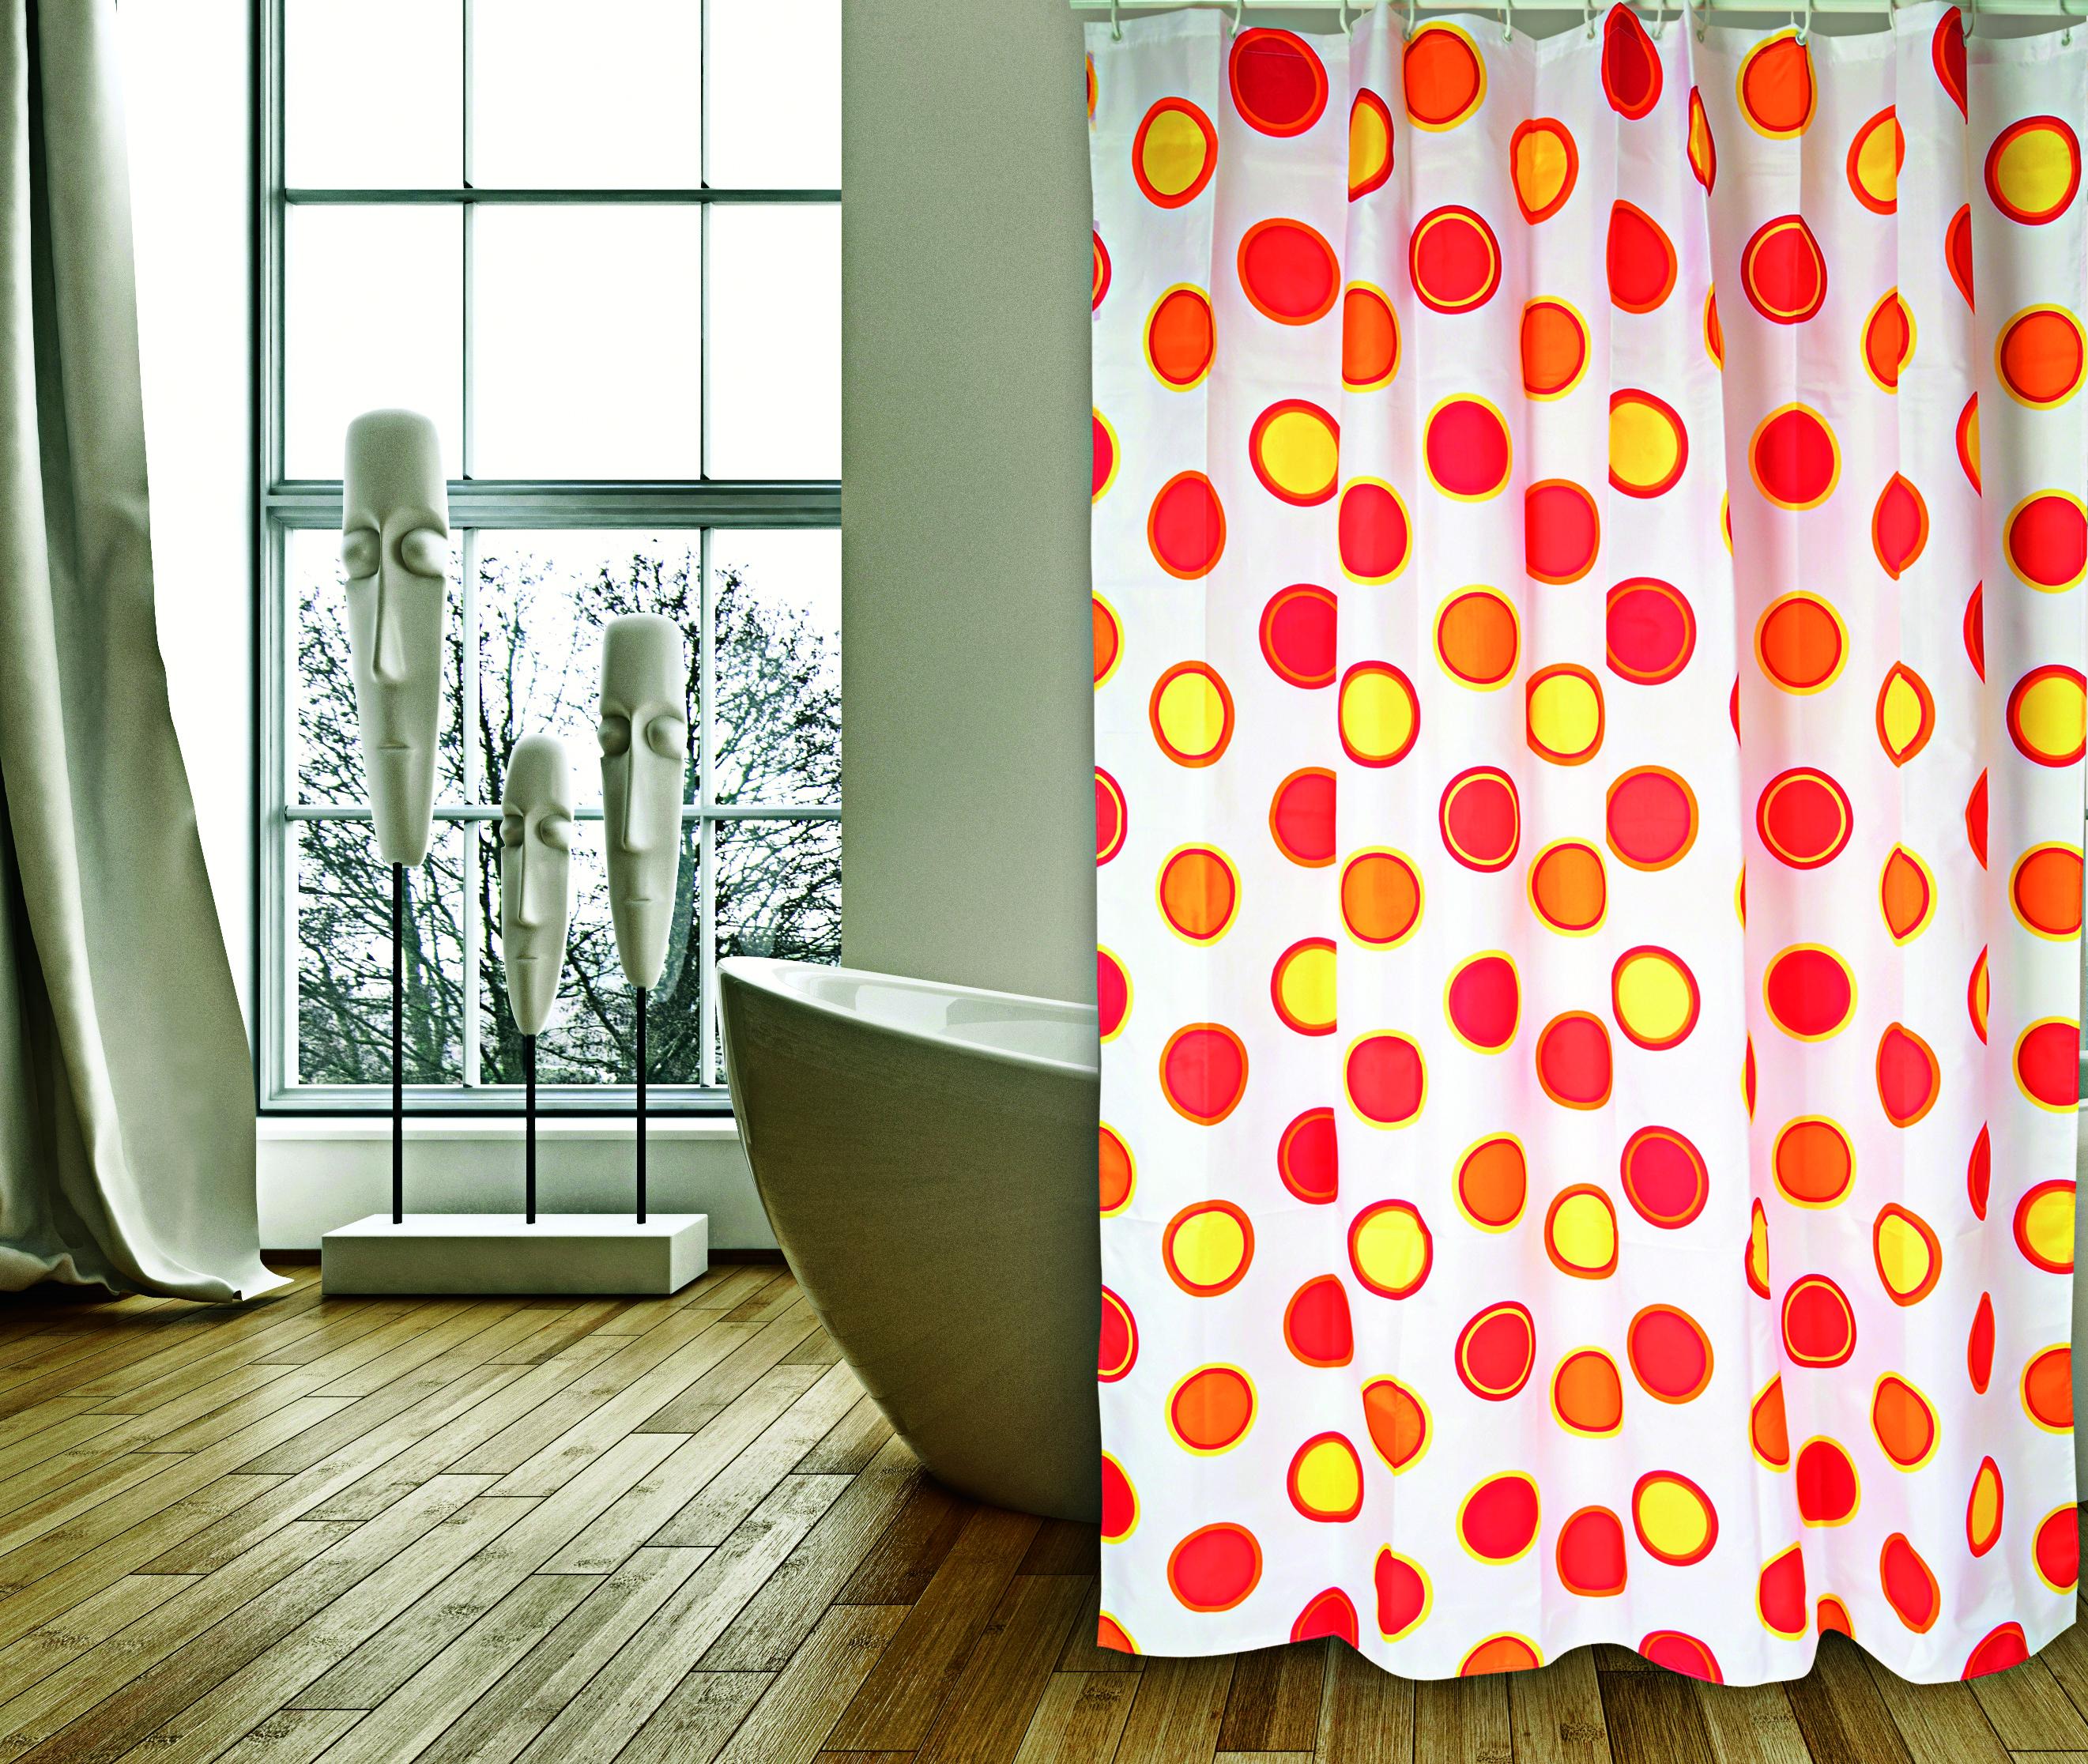 MSV Duschvorhang 180x200cm Anti Schimmel Textil Badewannenvorhang Wannenvorhang Kreise Rot